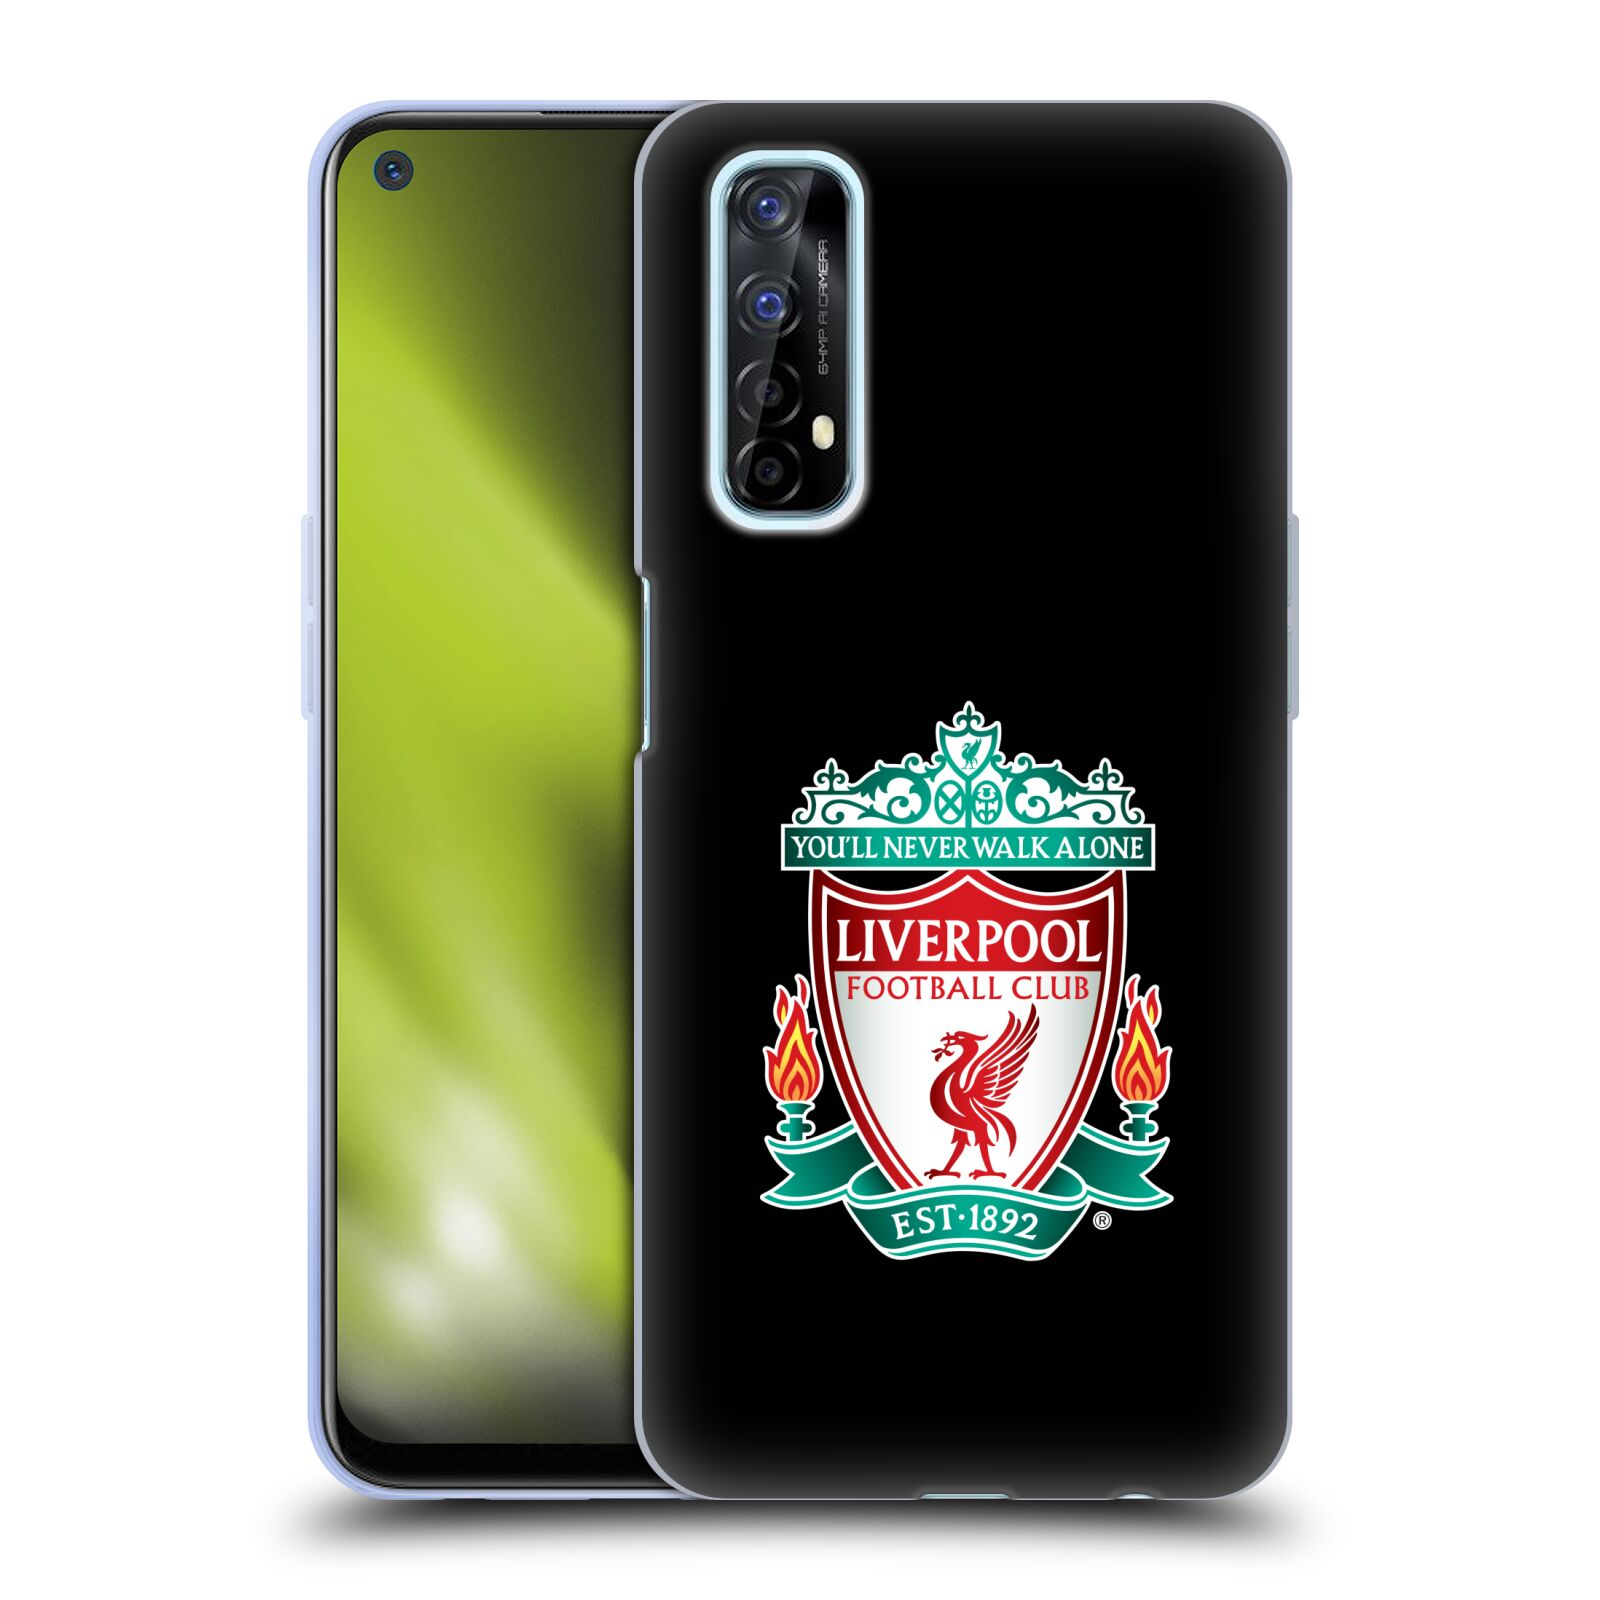 Silikonové pouzdro na mobil Realme 7 - Head Case - ZNAK LIVERPOOL FC OFFICIAL BLACK